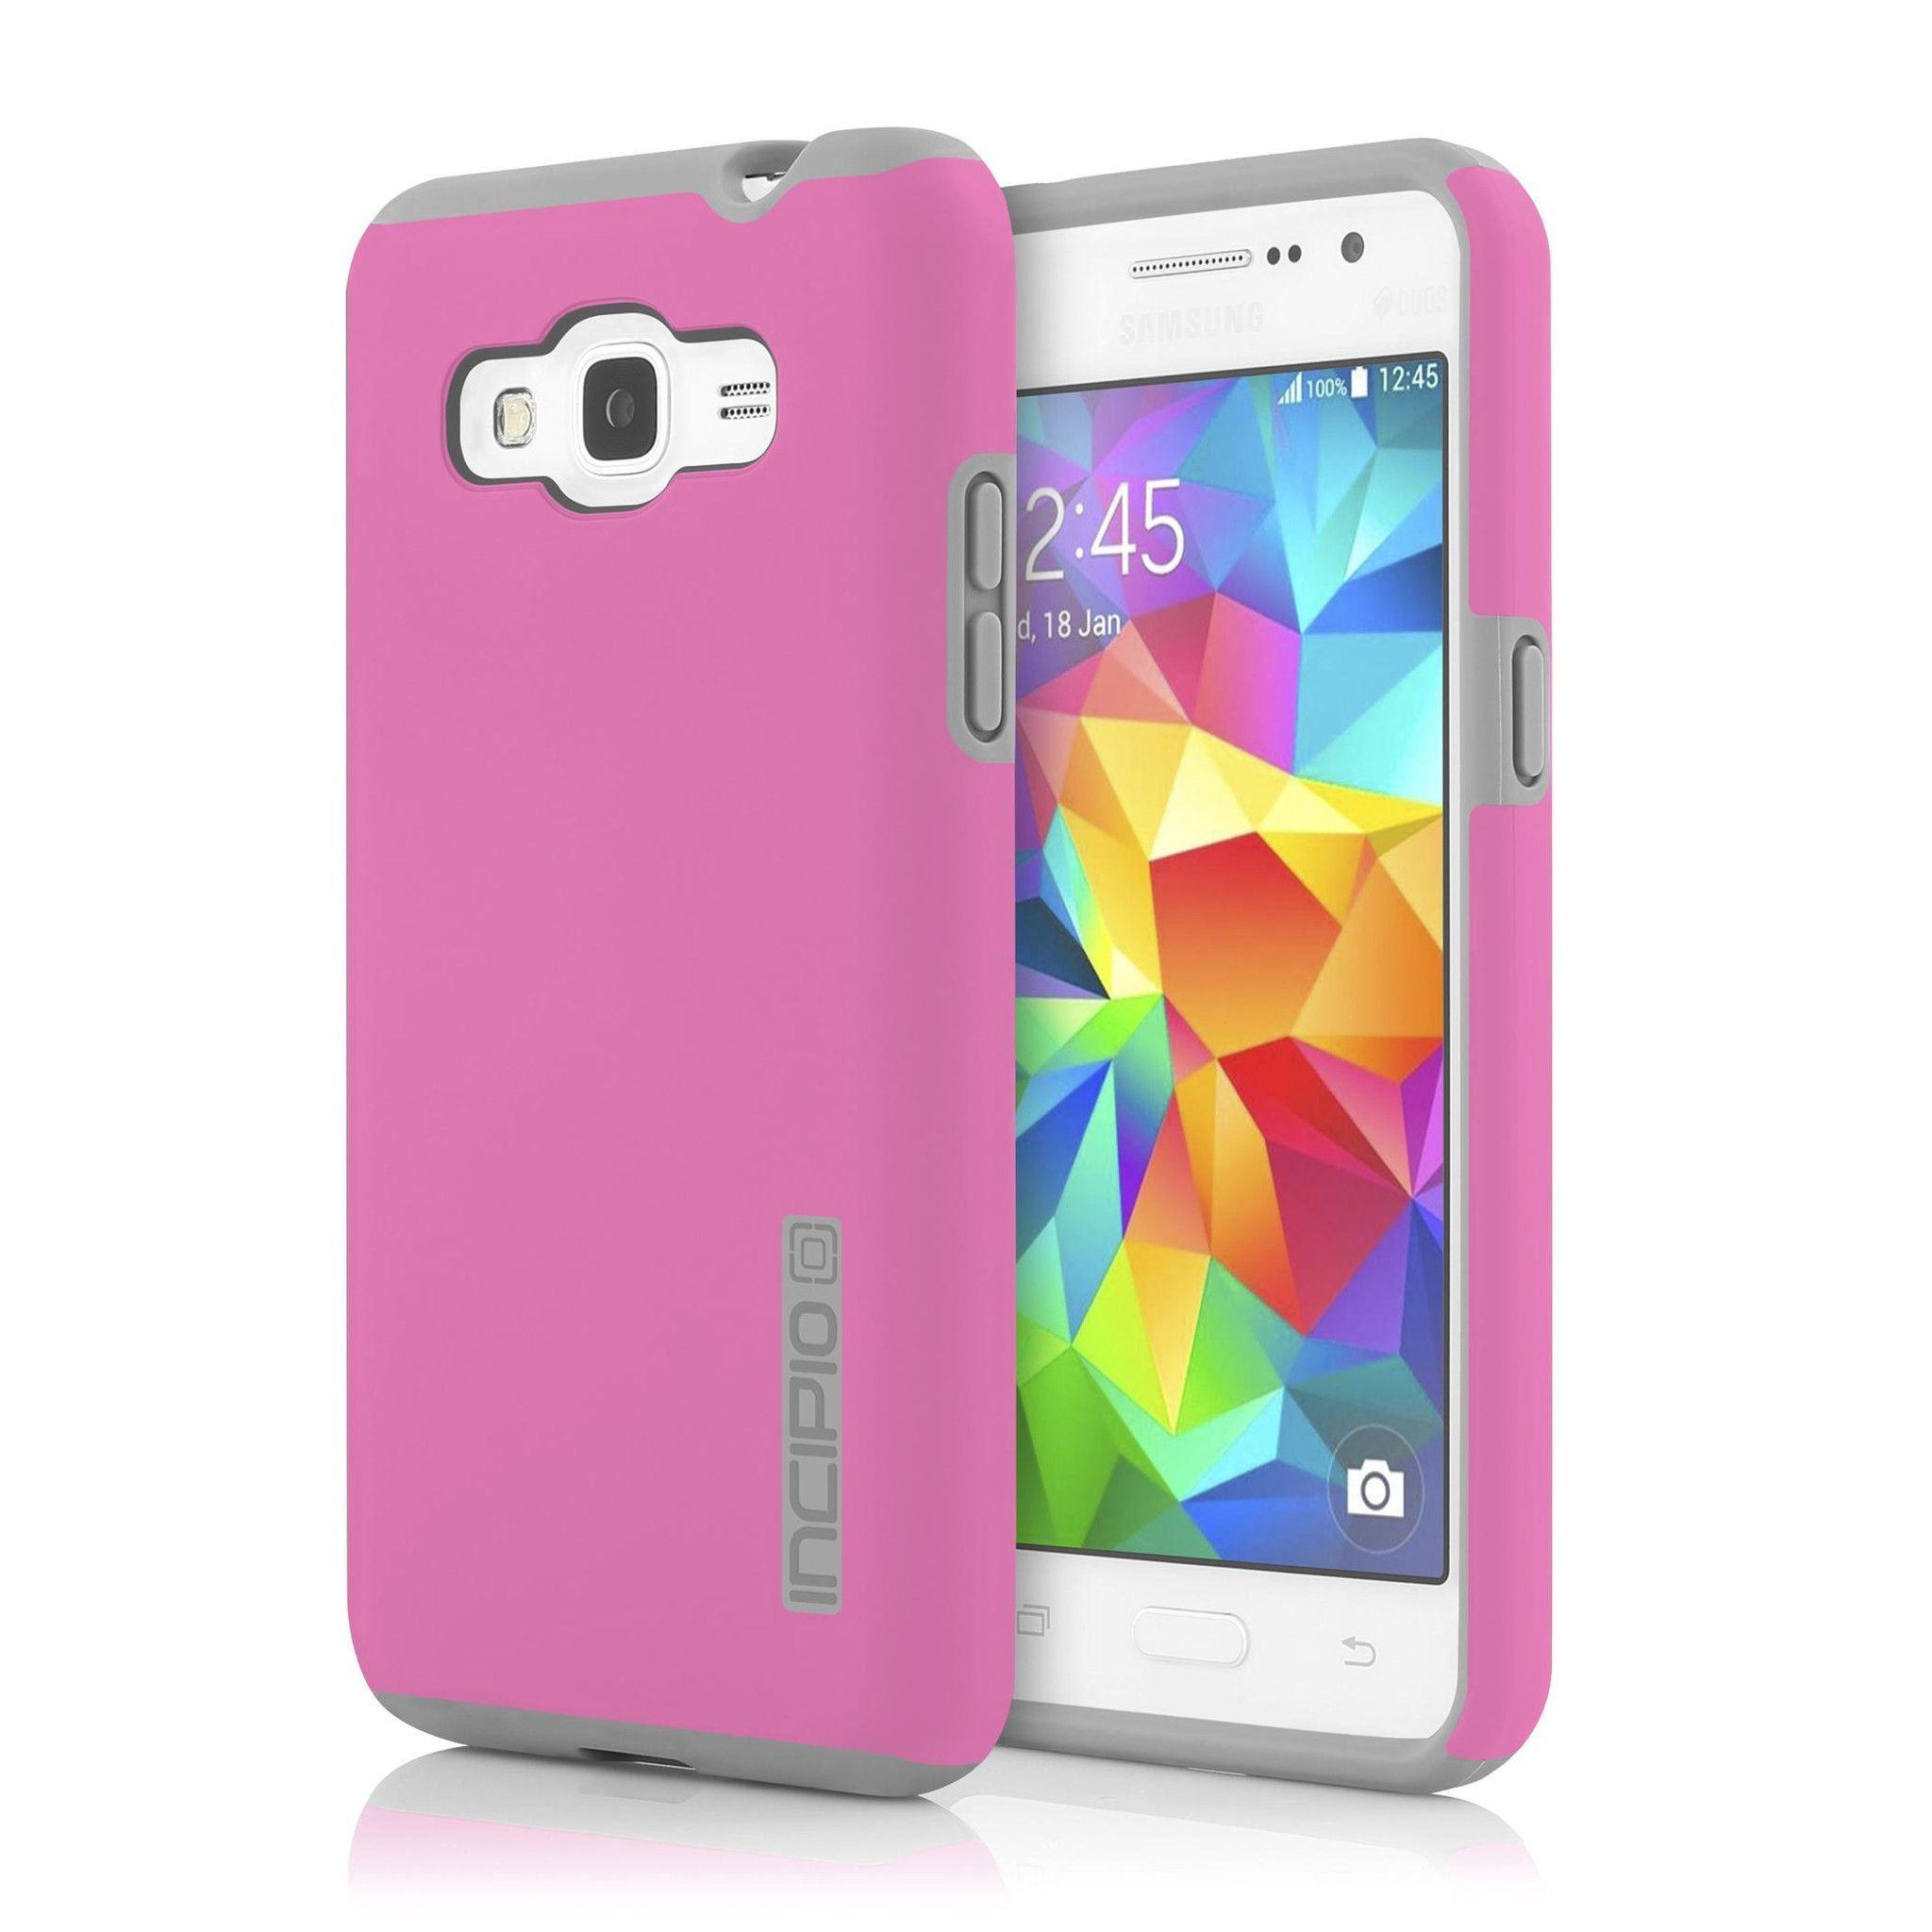 Incipio Samsung Galaxy Grand Prime Dual PRO Case - Pink